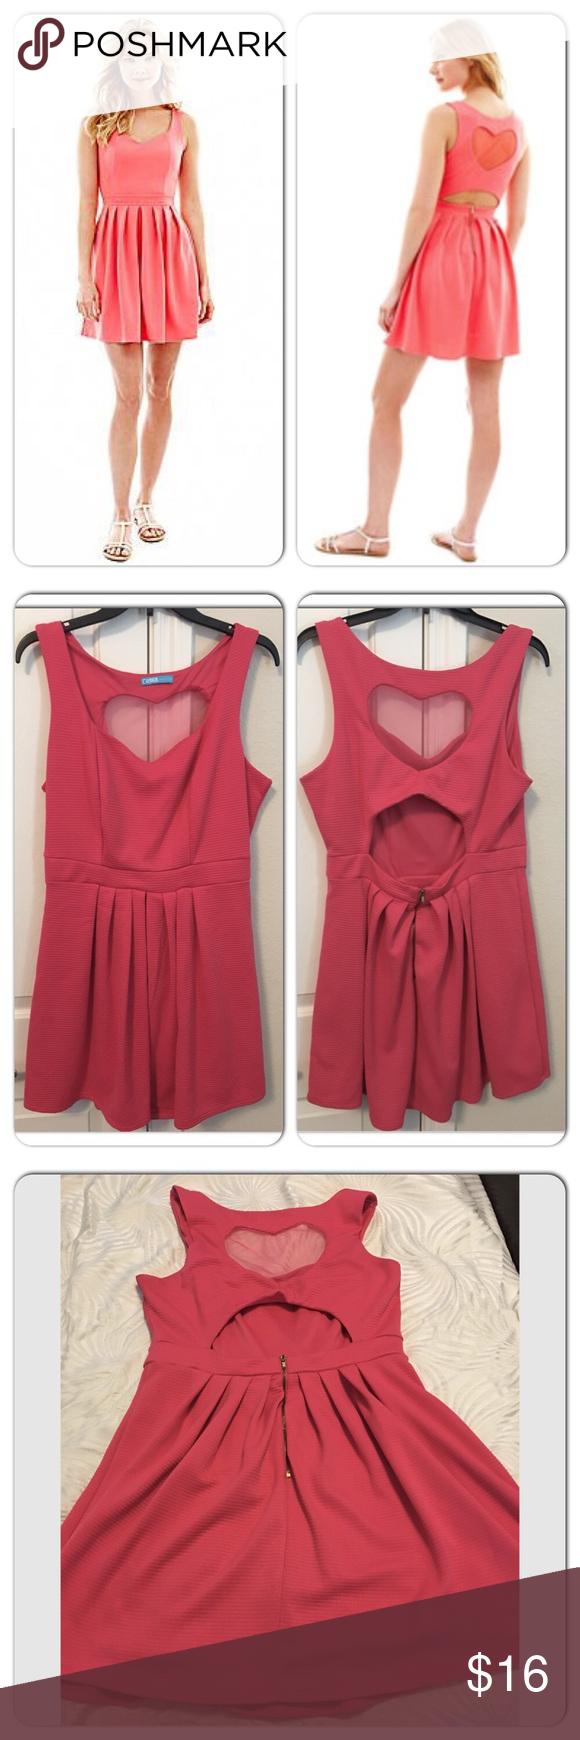 8f344e3ede L Amour Nanette Lepore Pink Heart Cutout Dress L Amour Nanette Lepore Pink  Heart